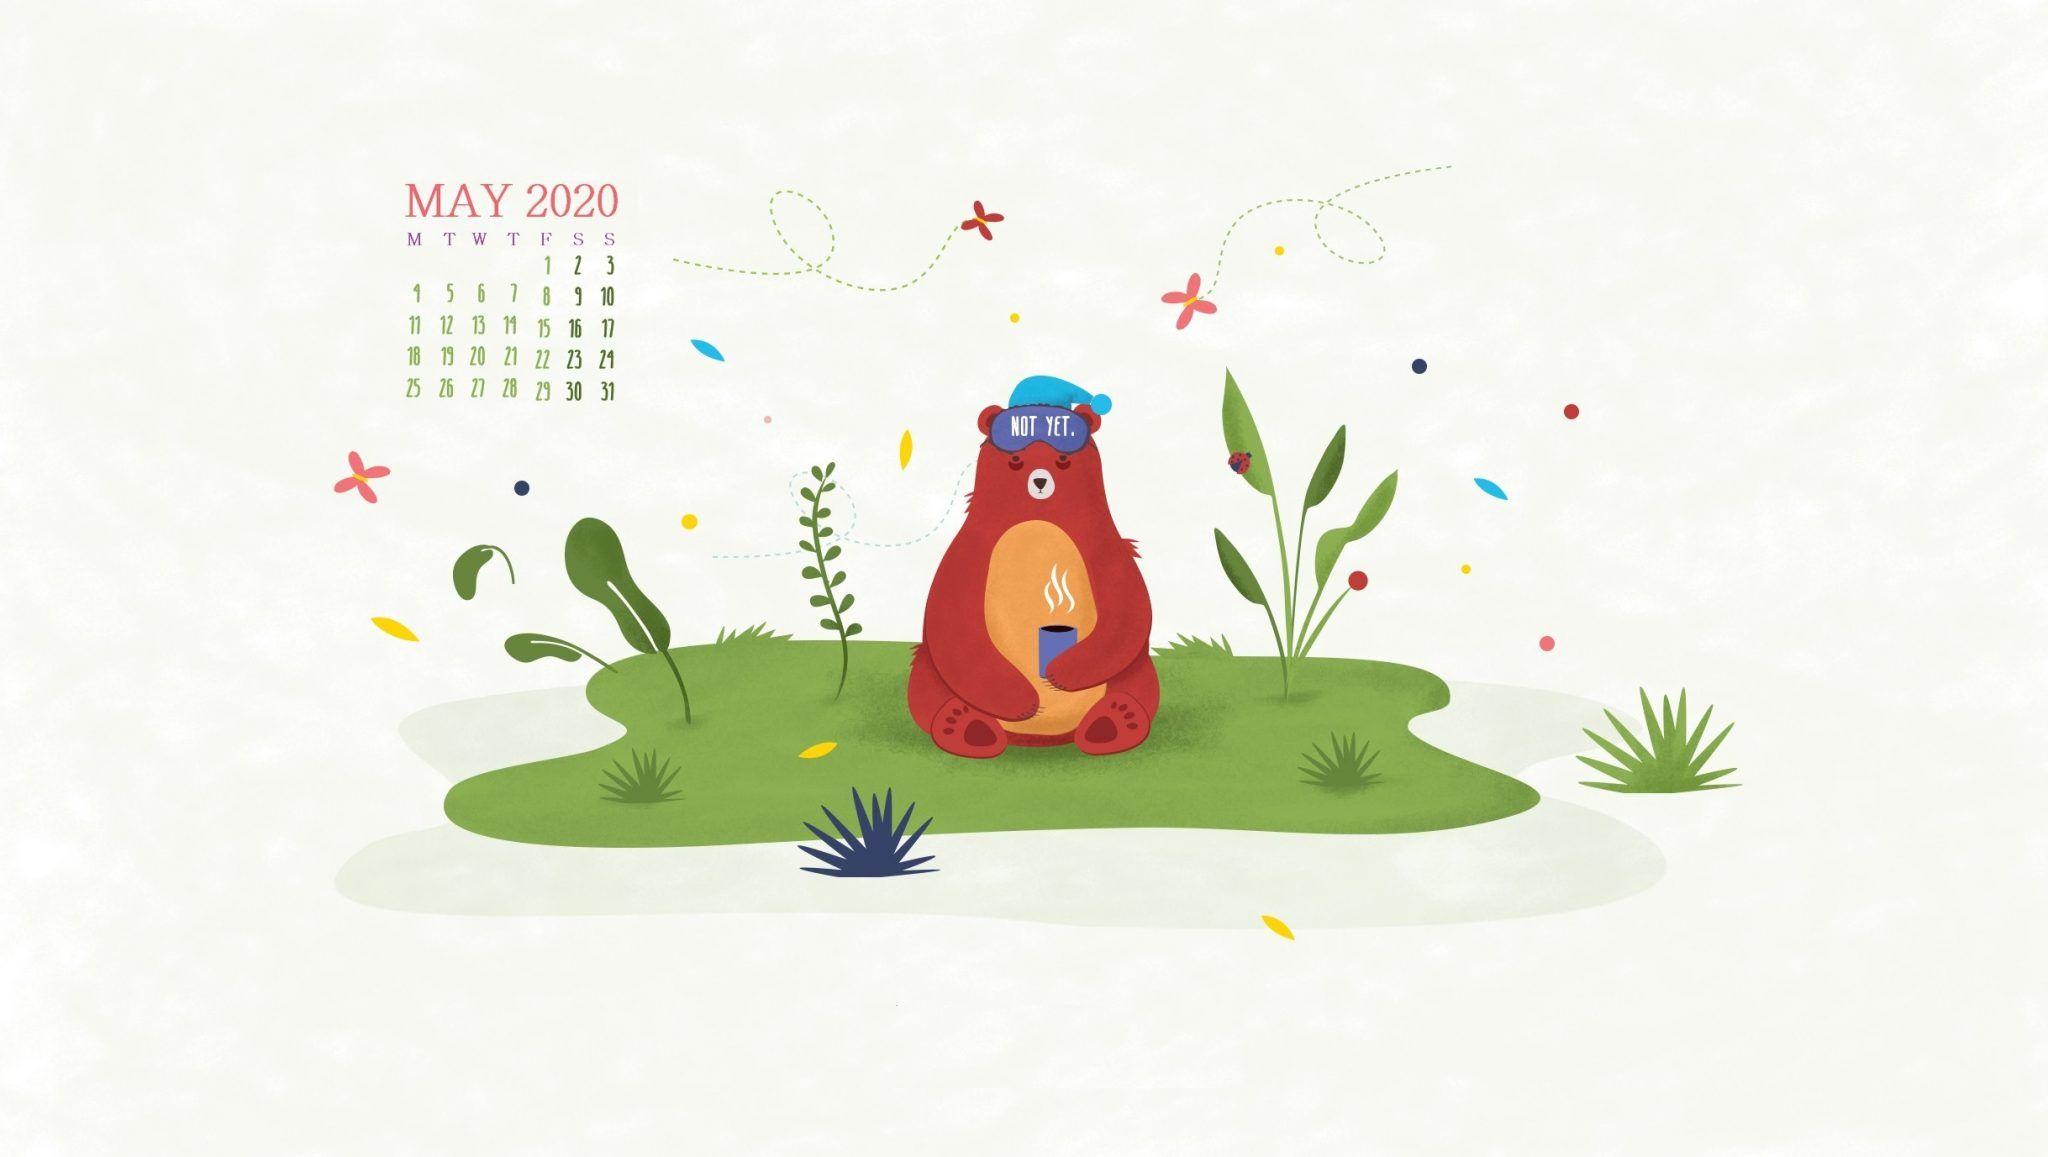 May 2020 Desktop Calendar Wallpaper in 2020 Calendar